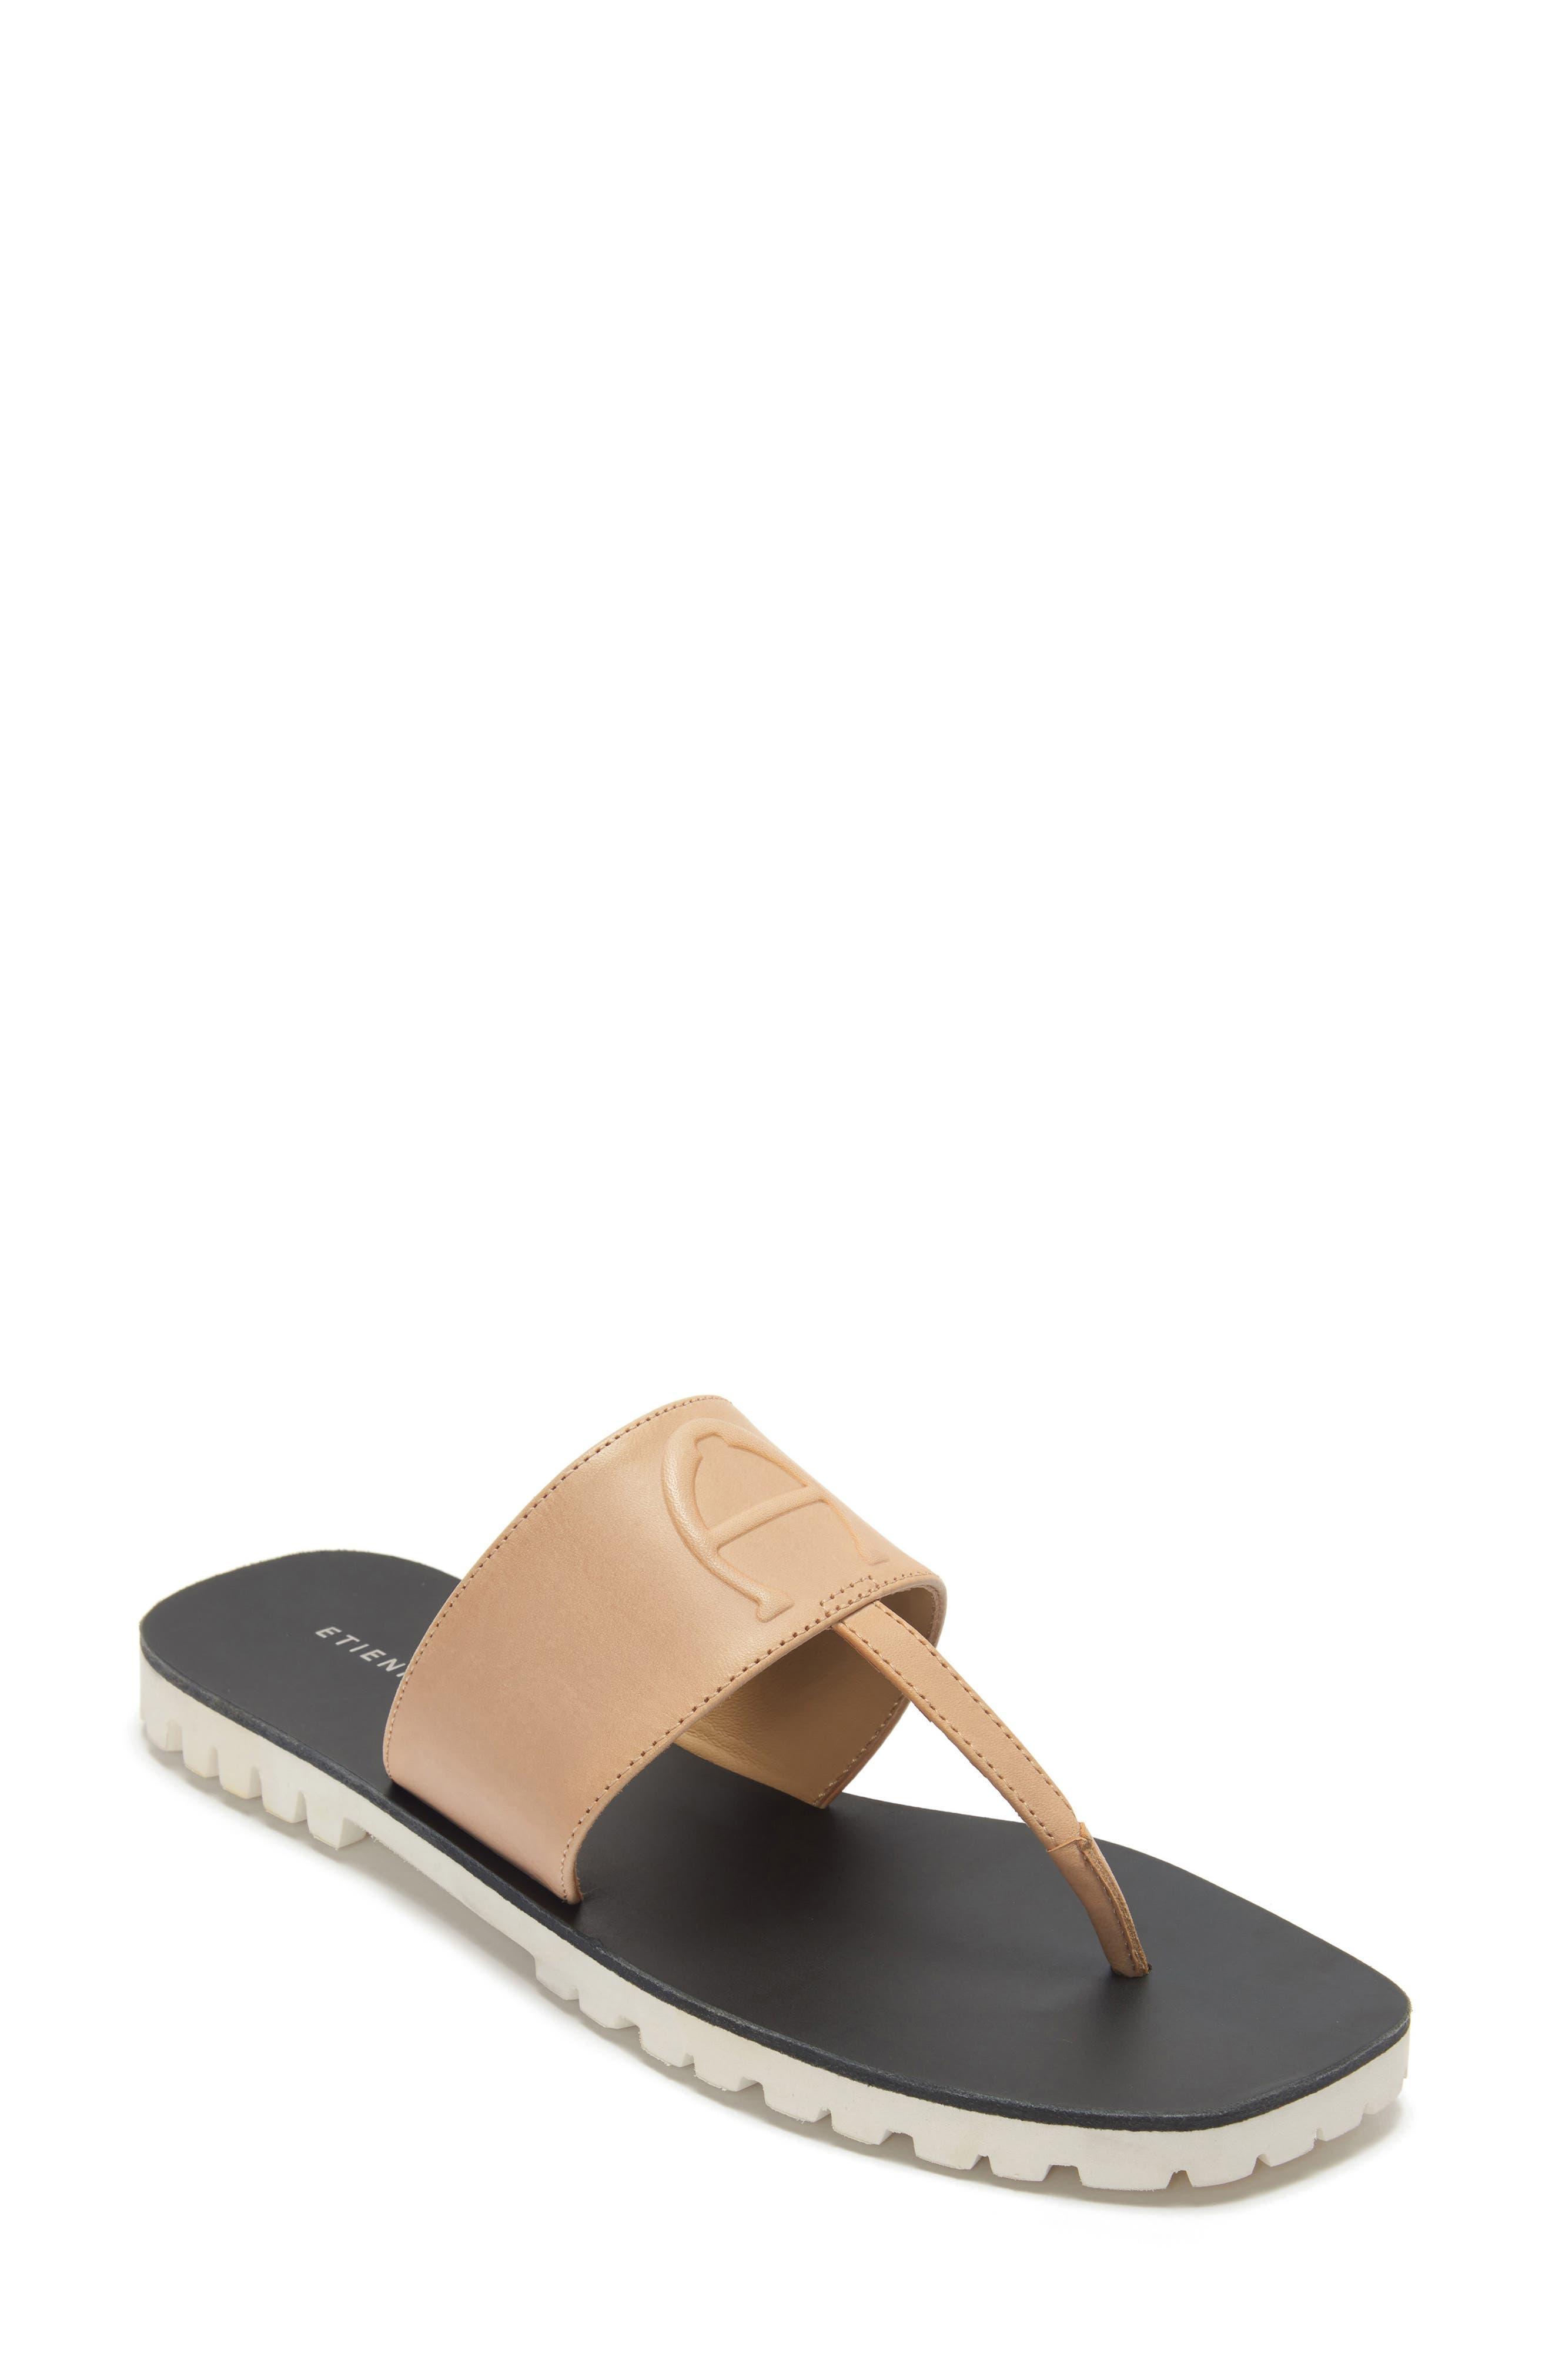 Palma Flip Flop